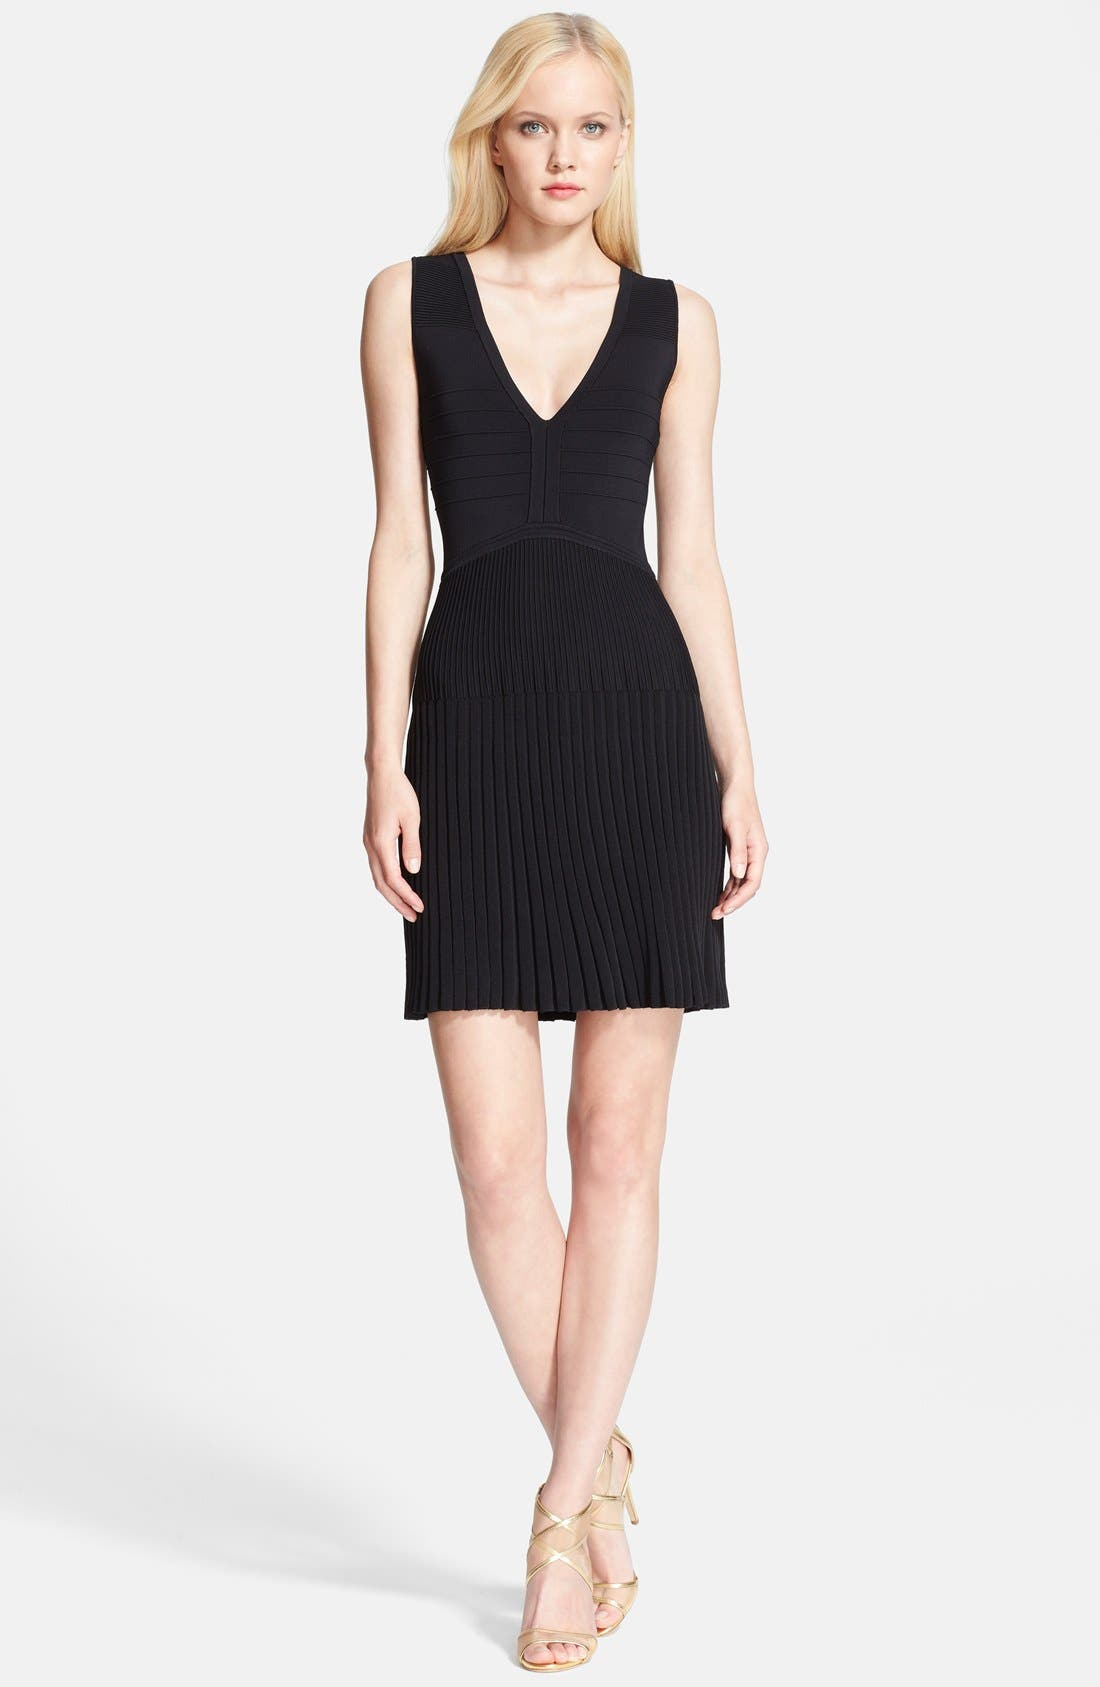 Alternate Image 1 Selected - Diane von Furstenberg 'Fit and Flare' Dress